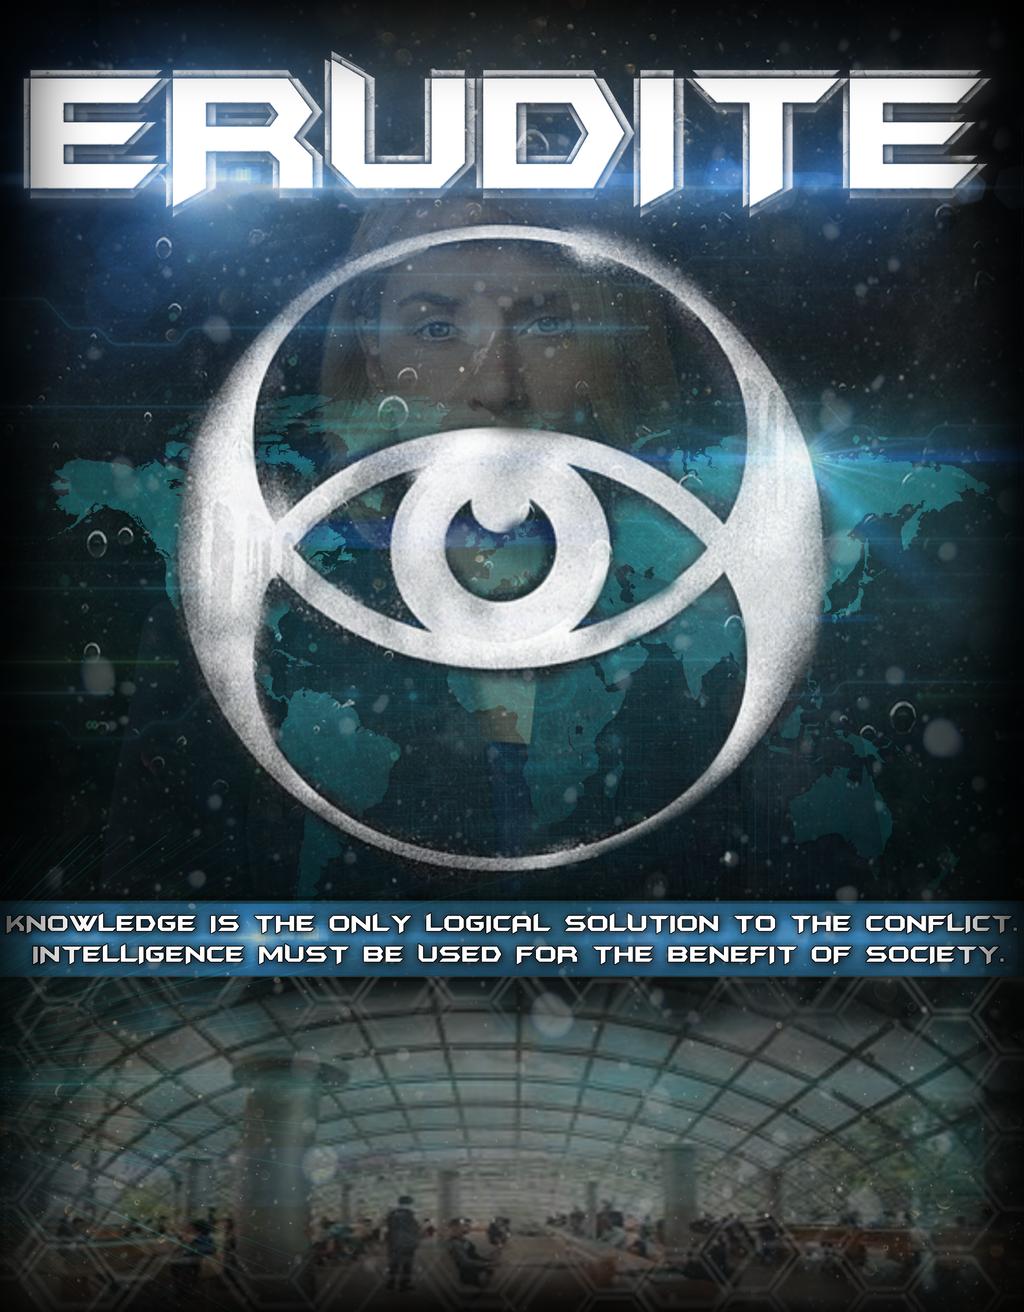 divergent faction poster erudite by vertigodesigns1 on